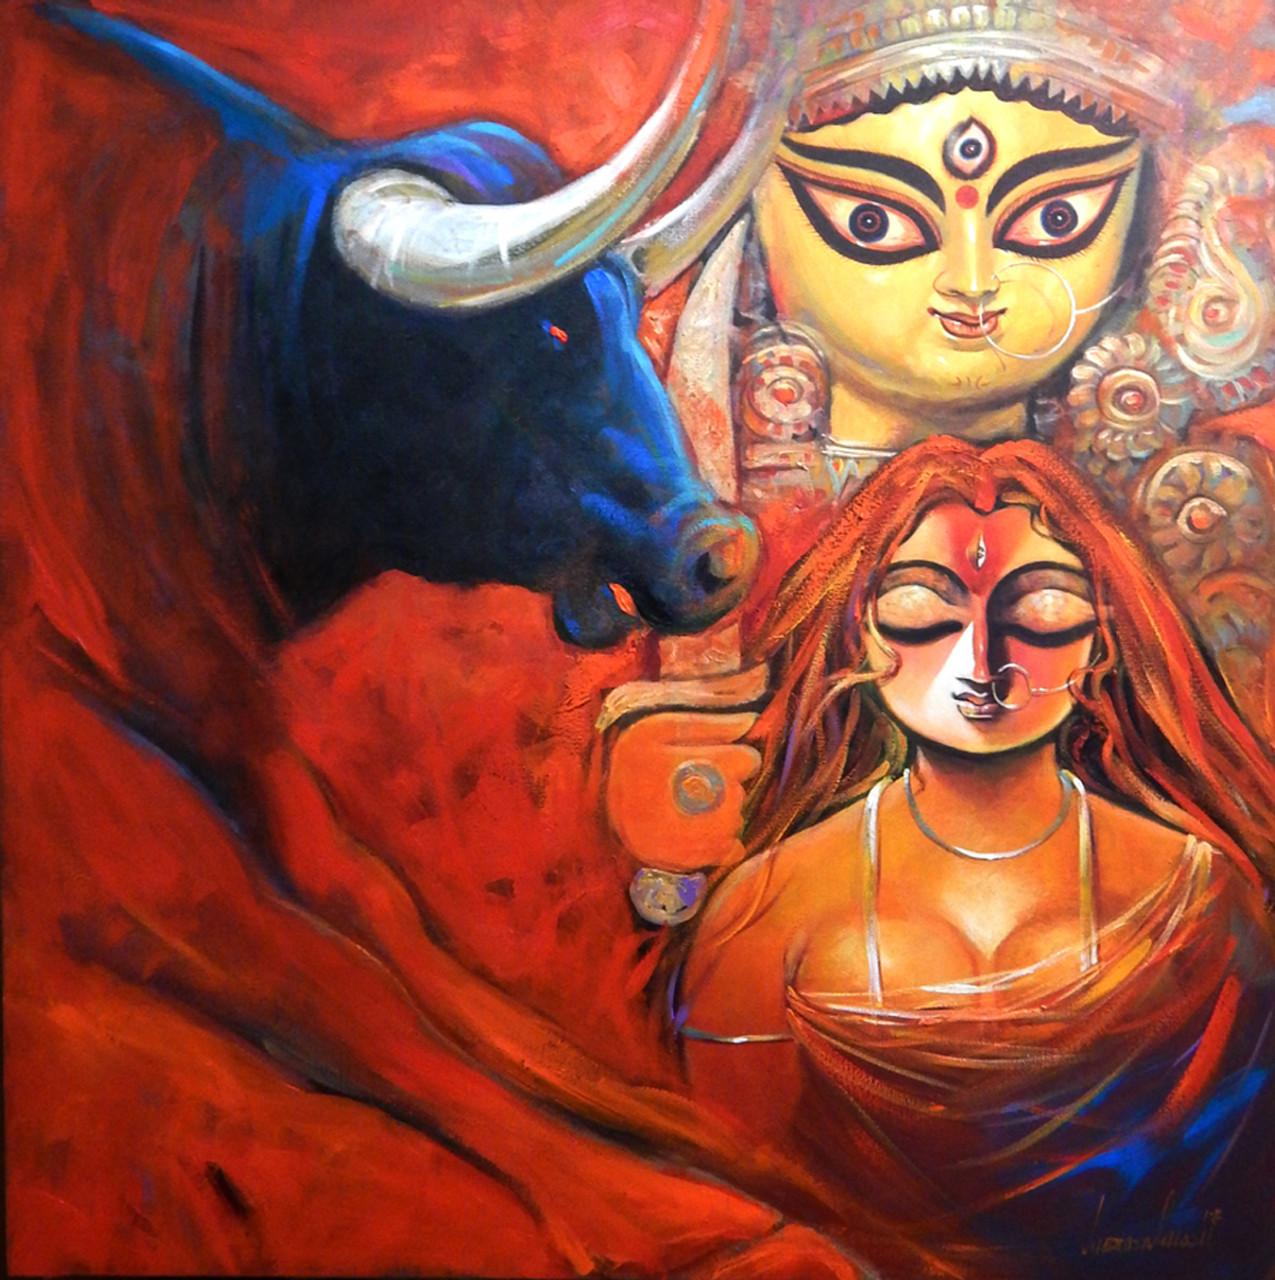 Shakti Ii Art 1469 27129 Handpainted Art Painting 48in X 48in